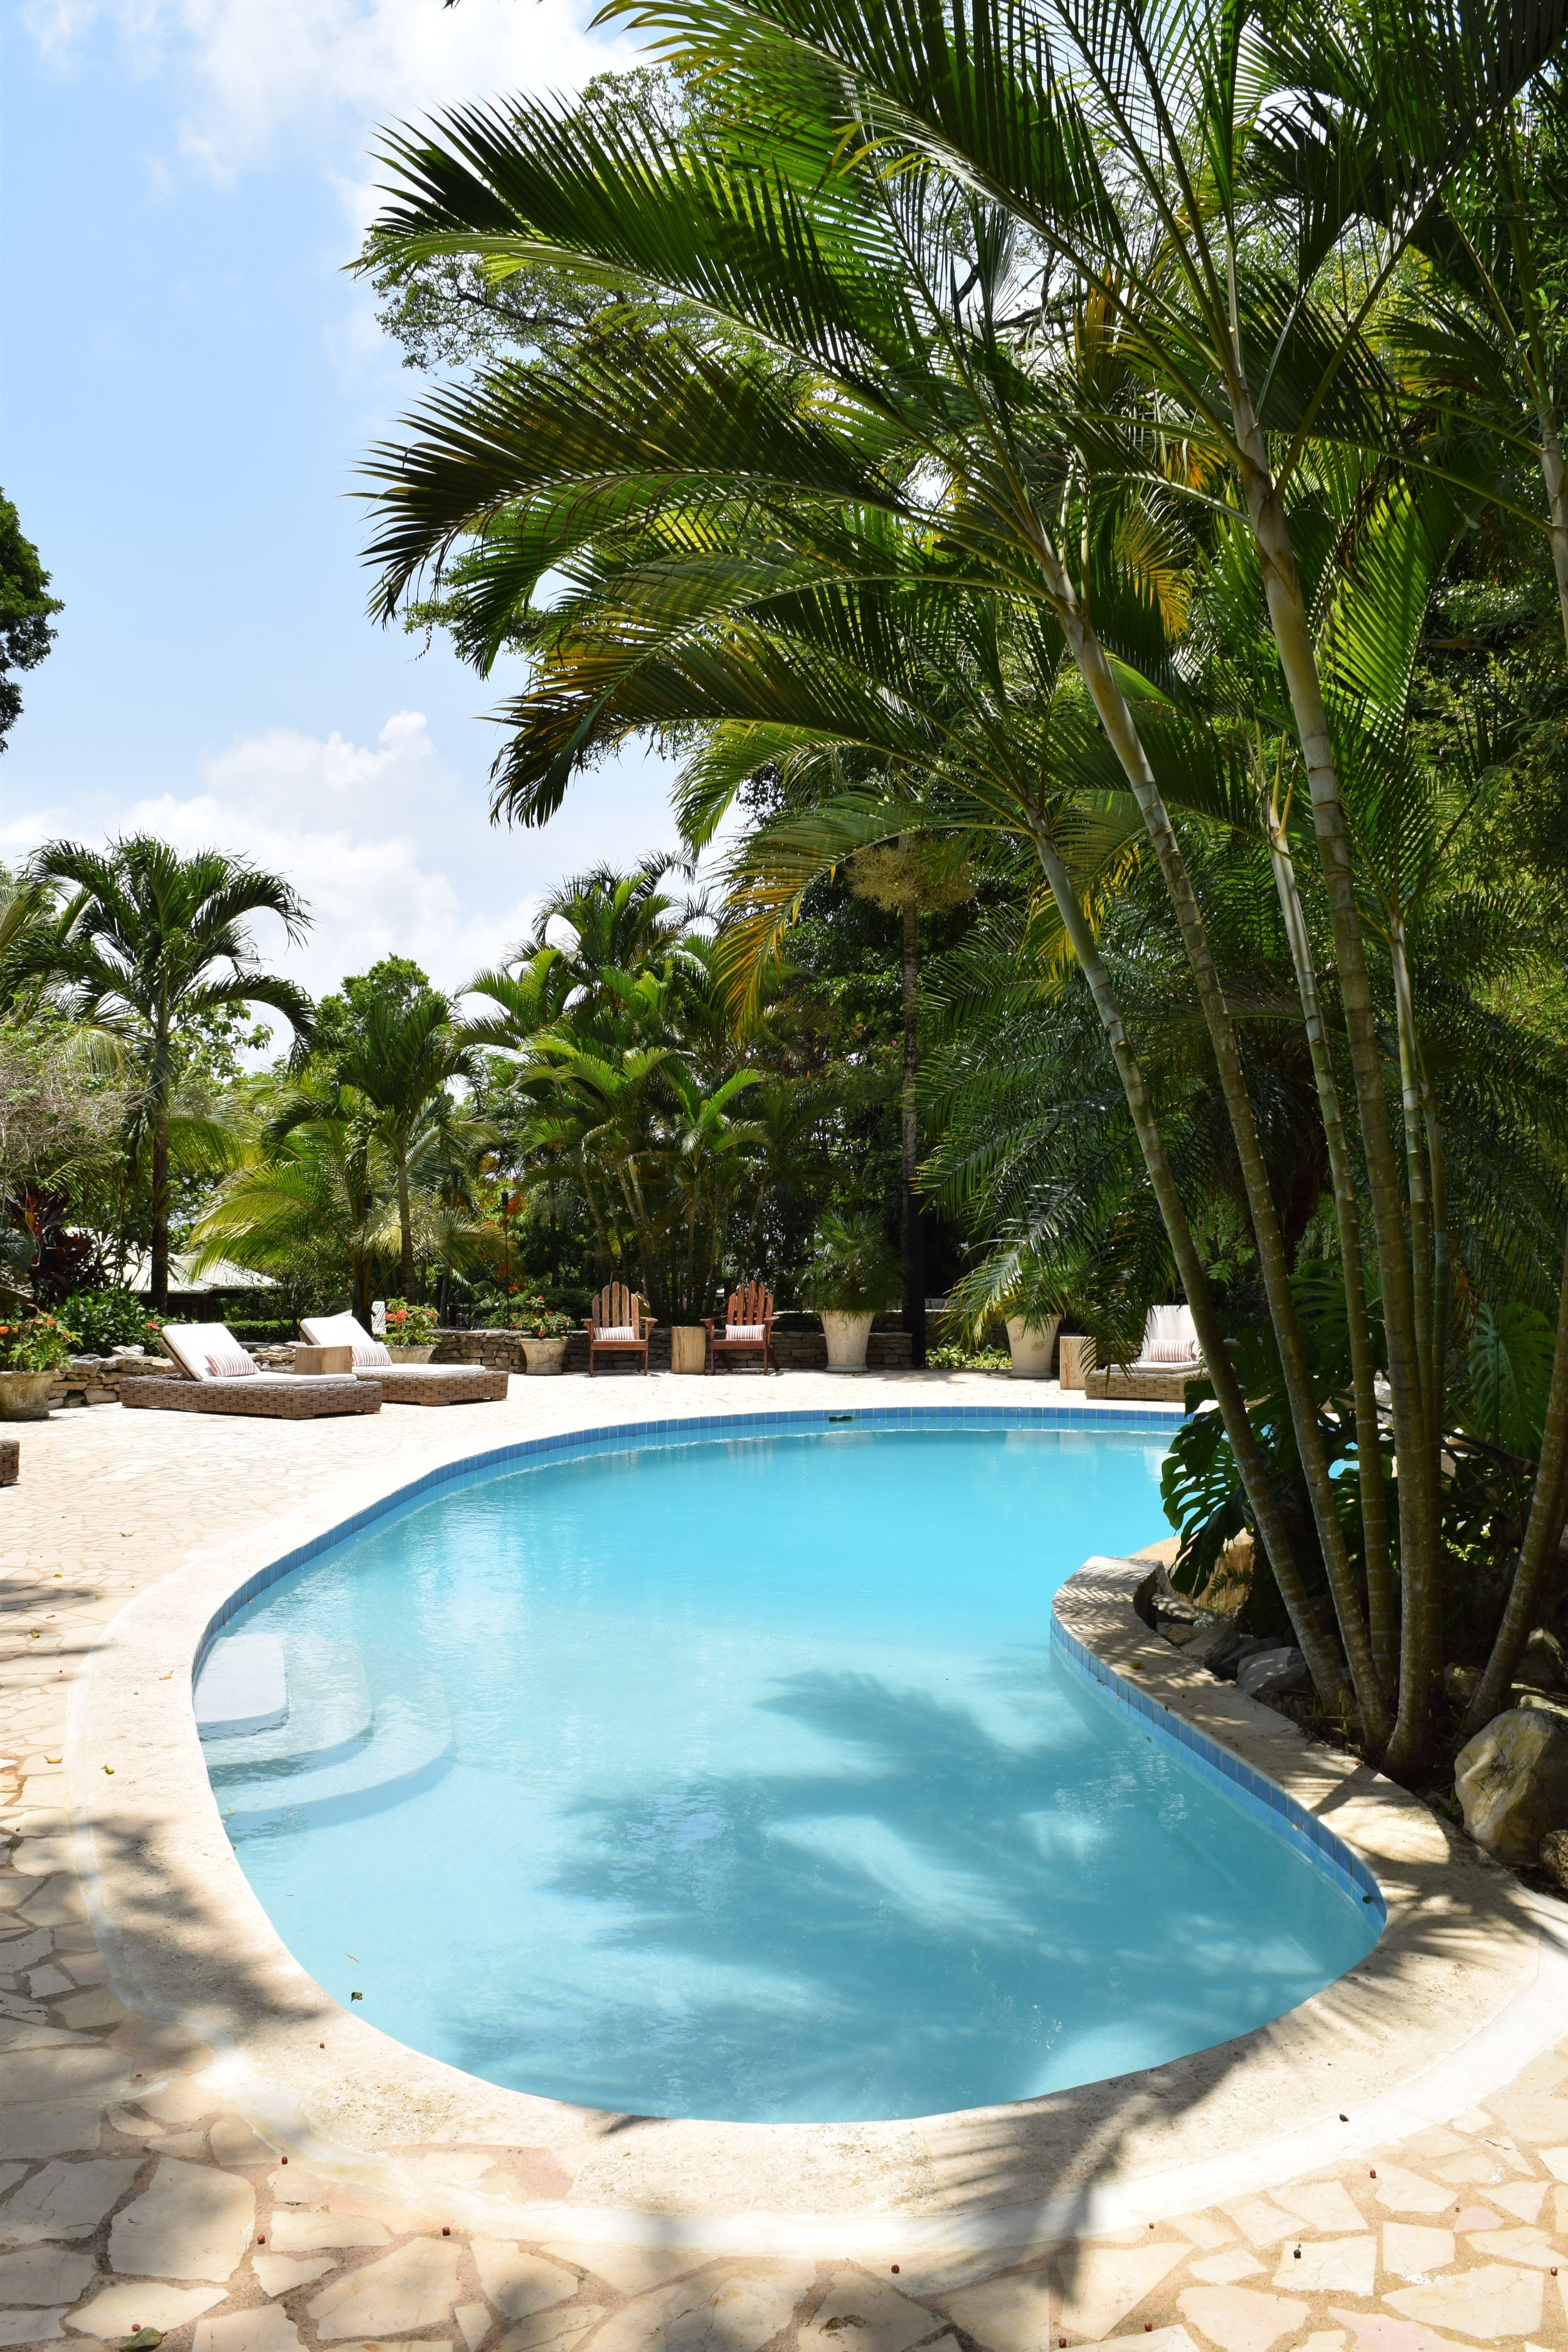 Copal Tree Lodge - Jungle lodge with organic farm and rainforest adventures